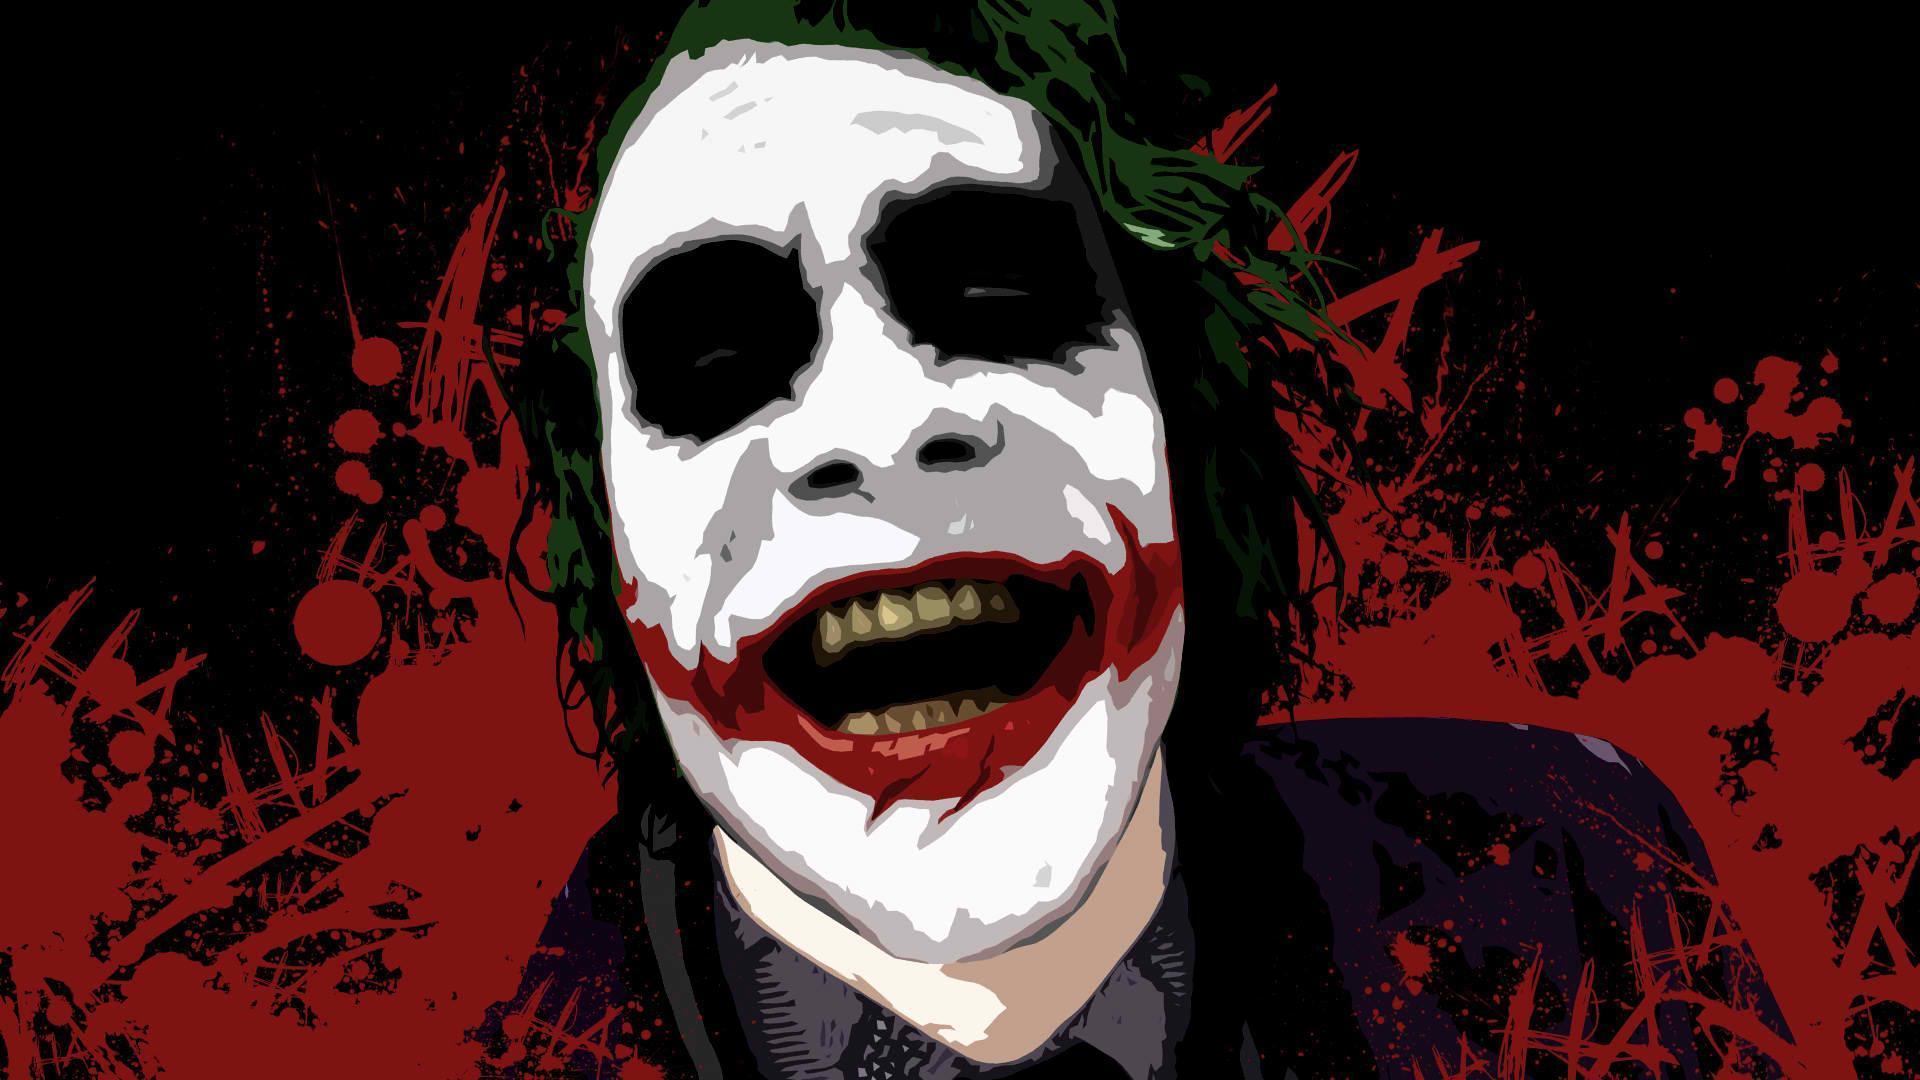 Heath Ledger Joker Wallpapers 1920x1080